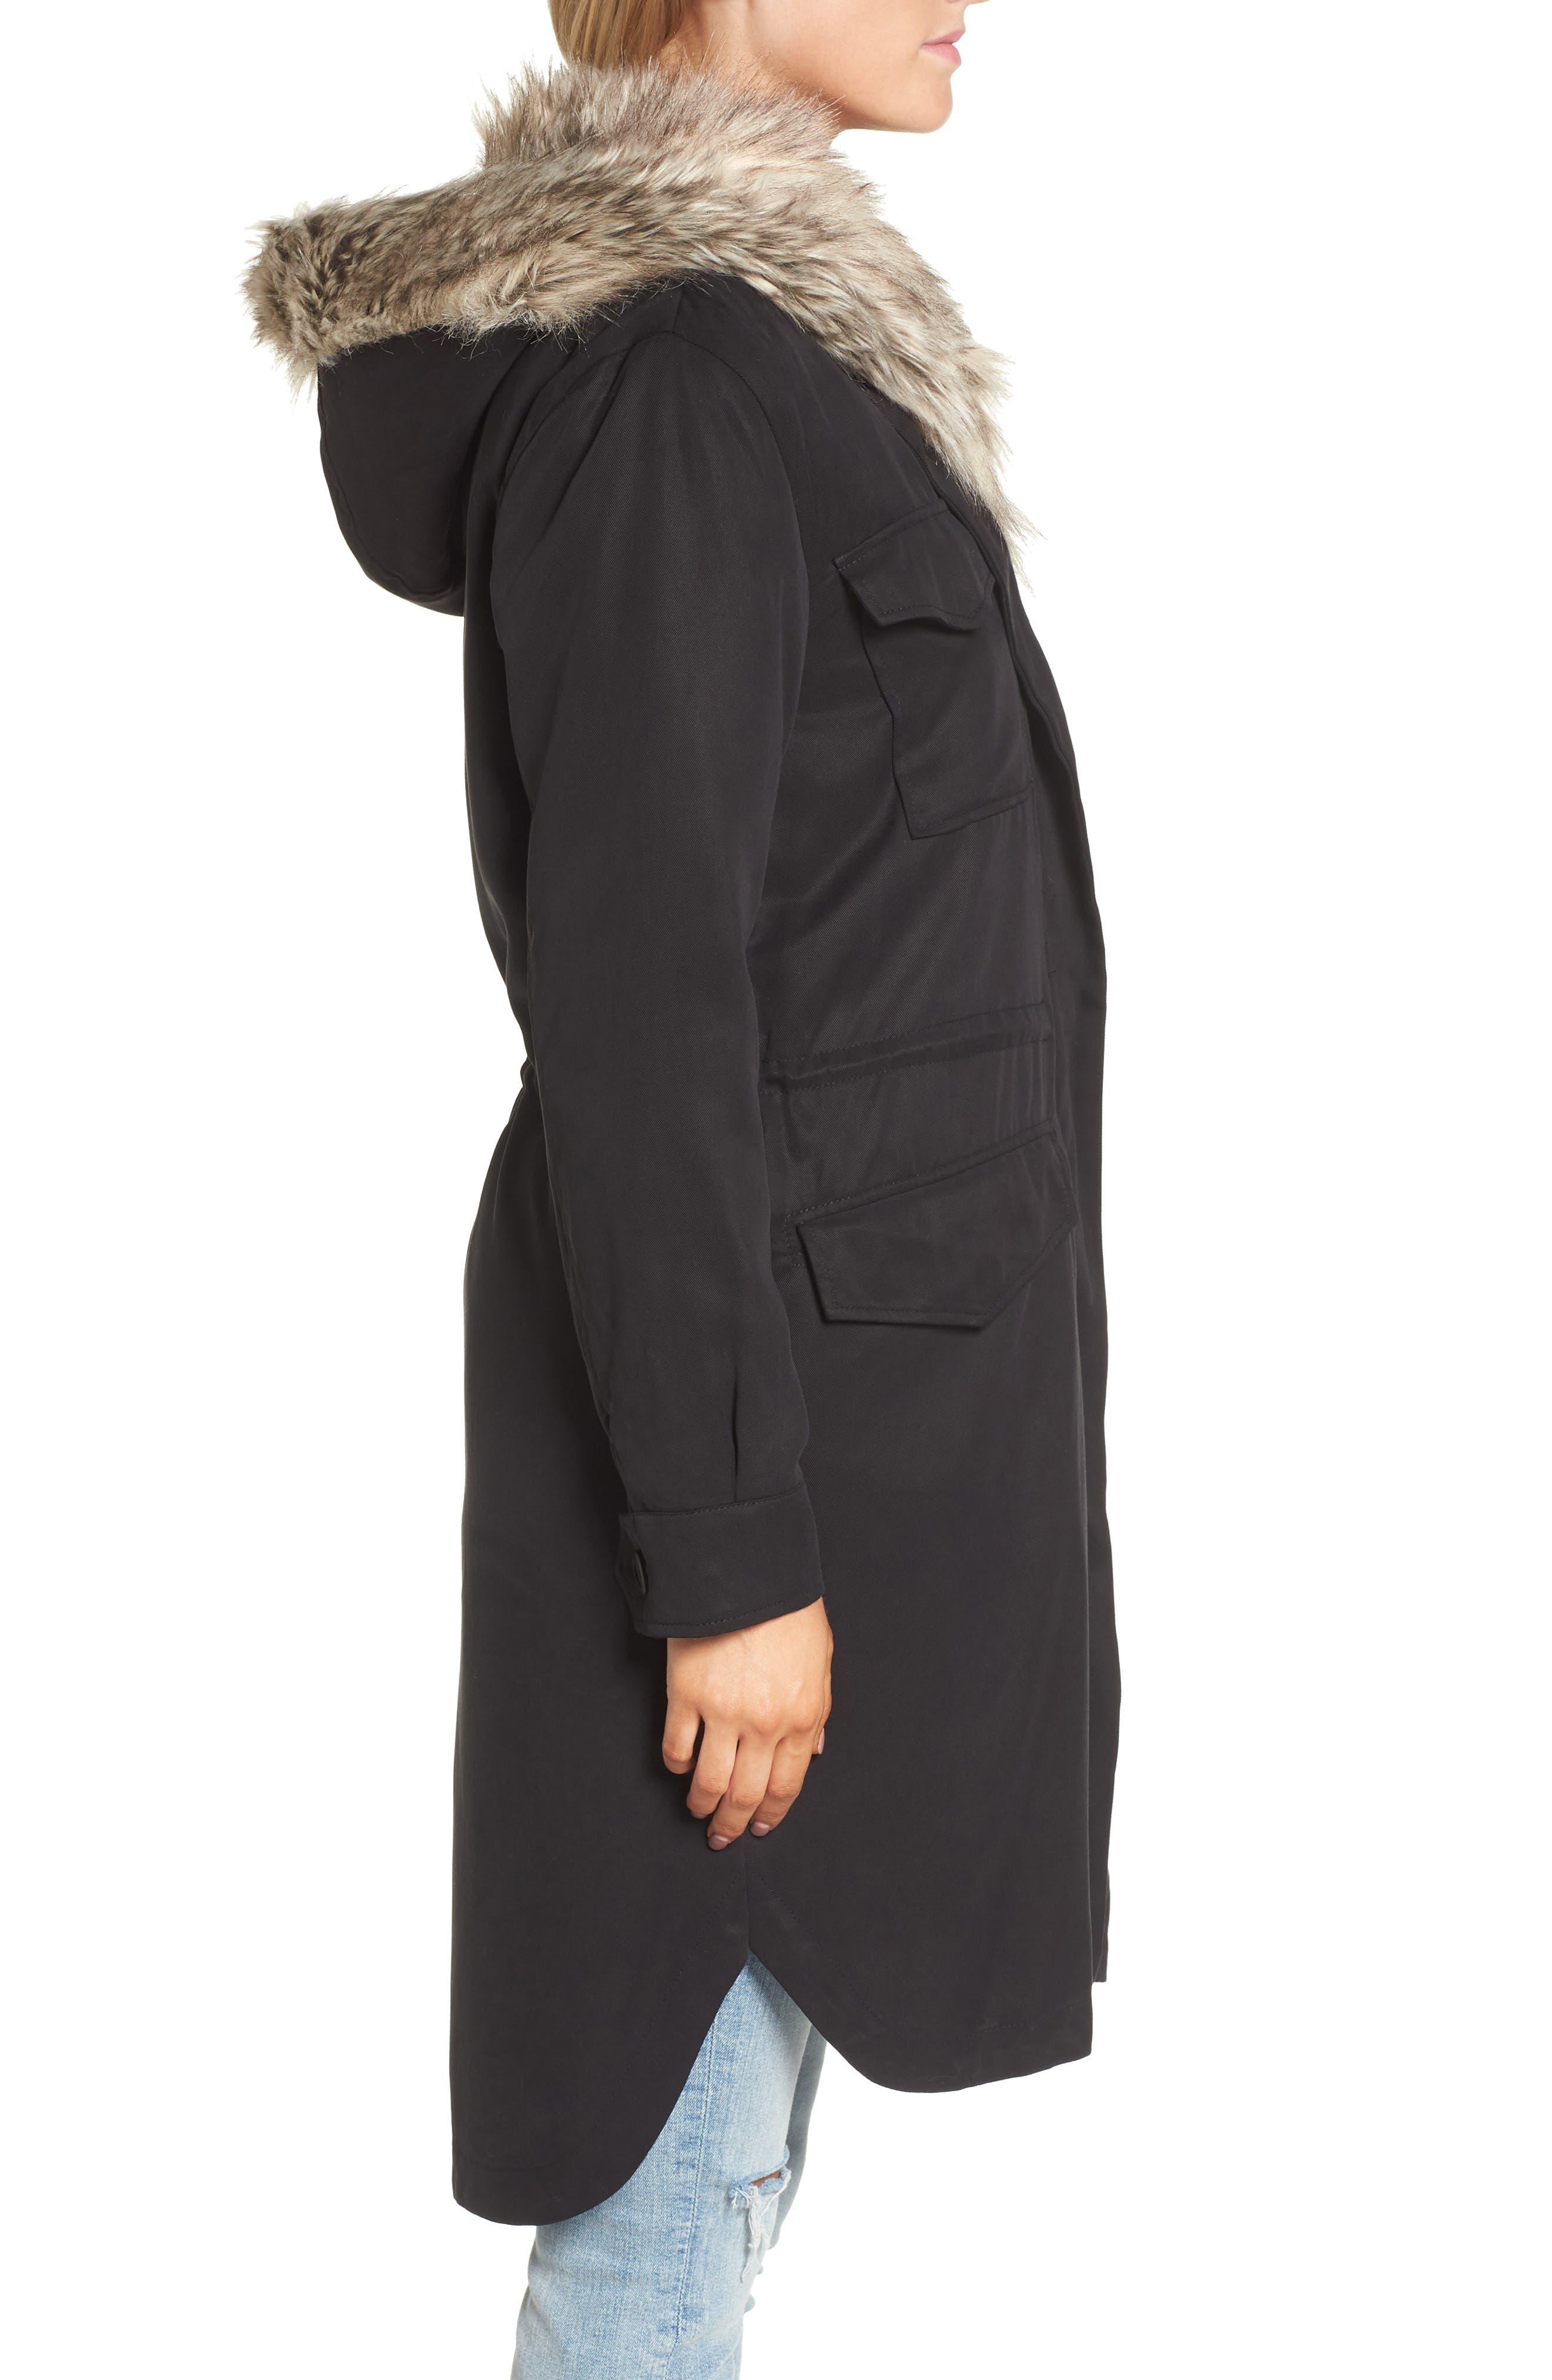 Walsh Tencel<sup>®</sup> Coat with Detachable Hooded Faux Fur Vest,                             Alternate thumbnail 3, color,                             001